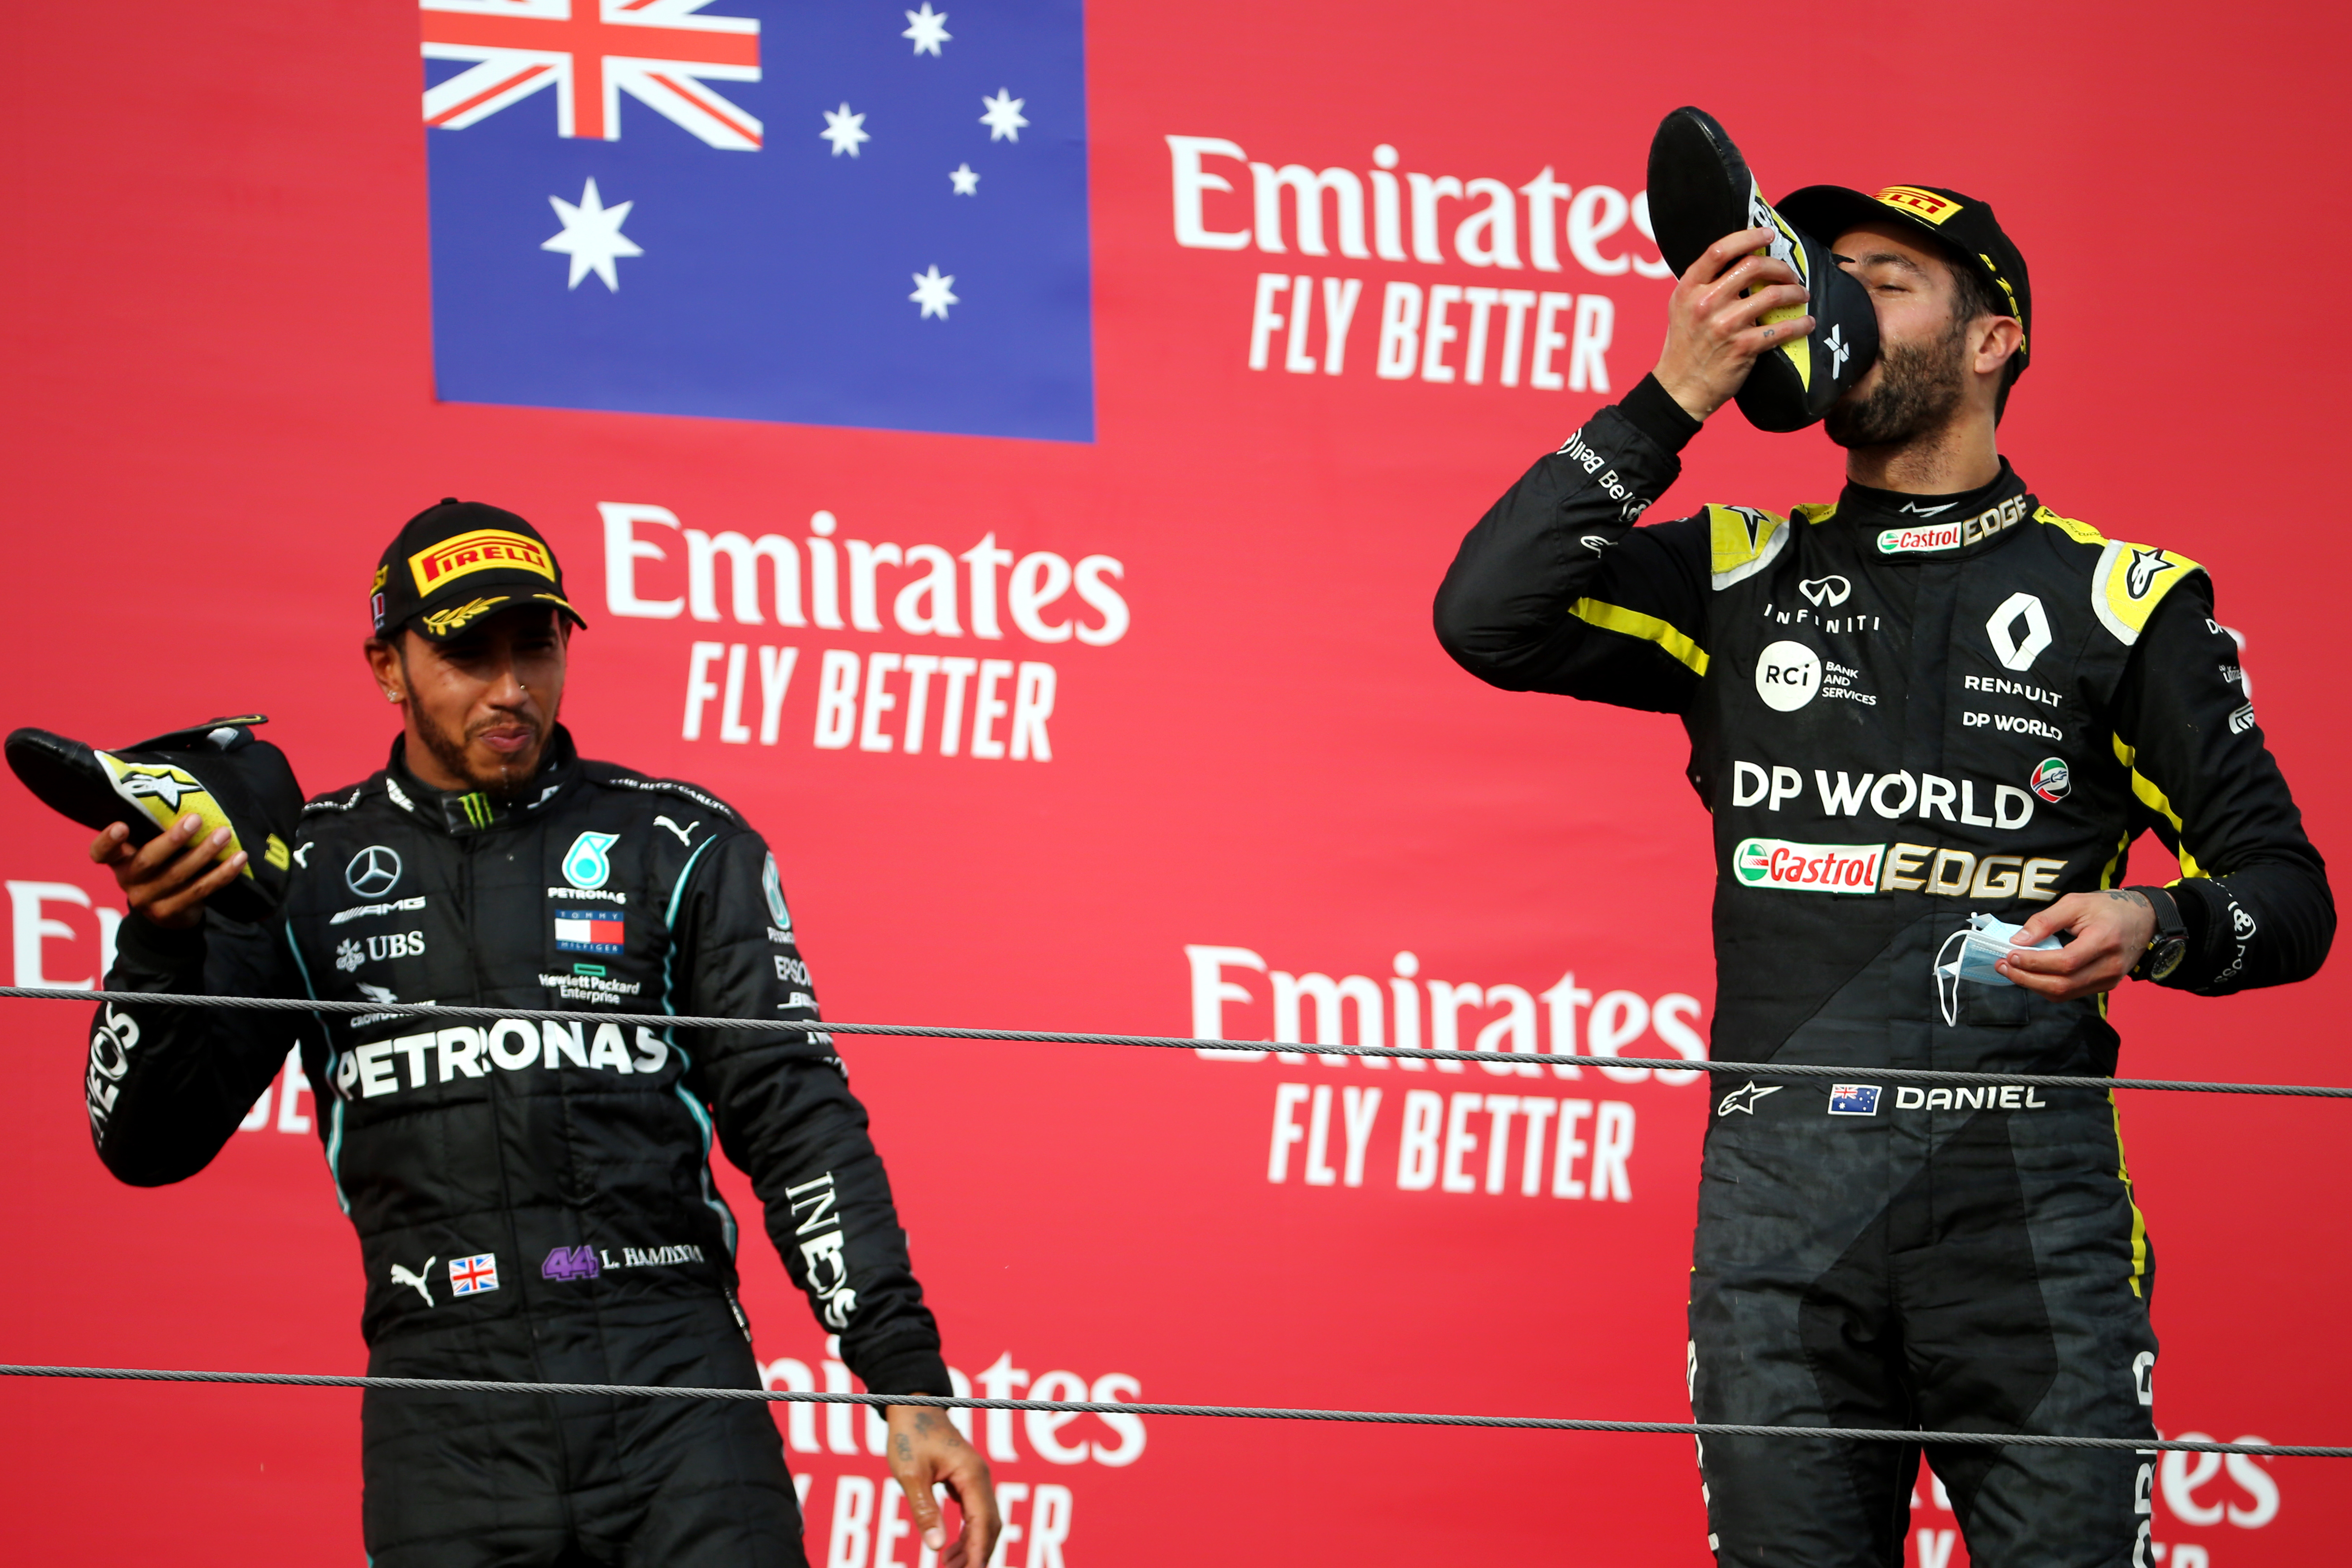 Daniel Ricciardo - Renault F1 Team [2019]